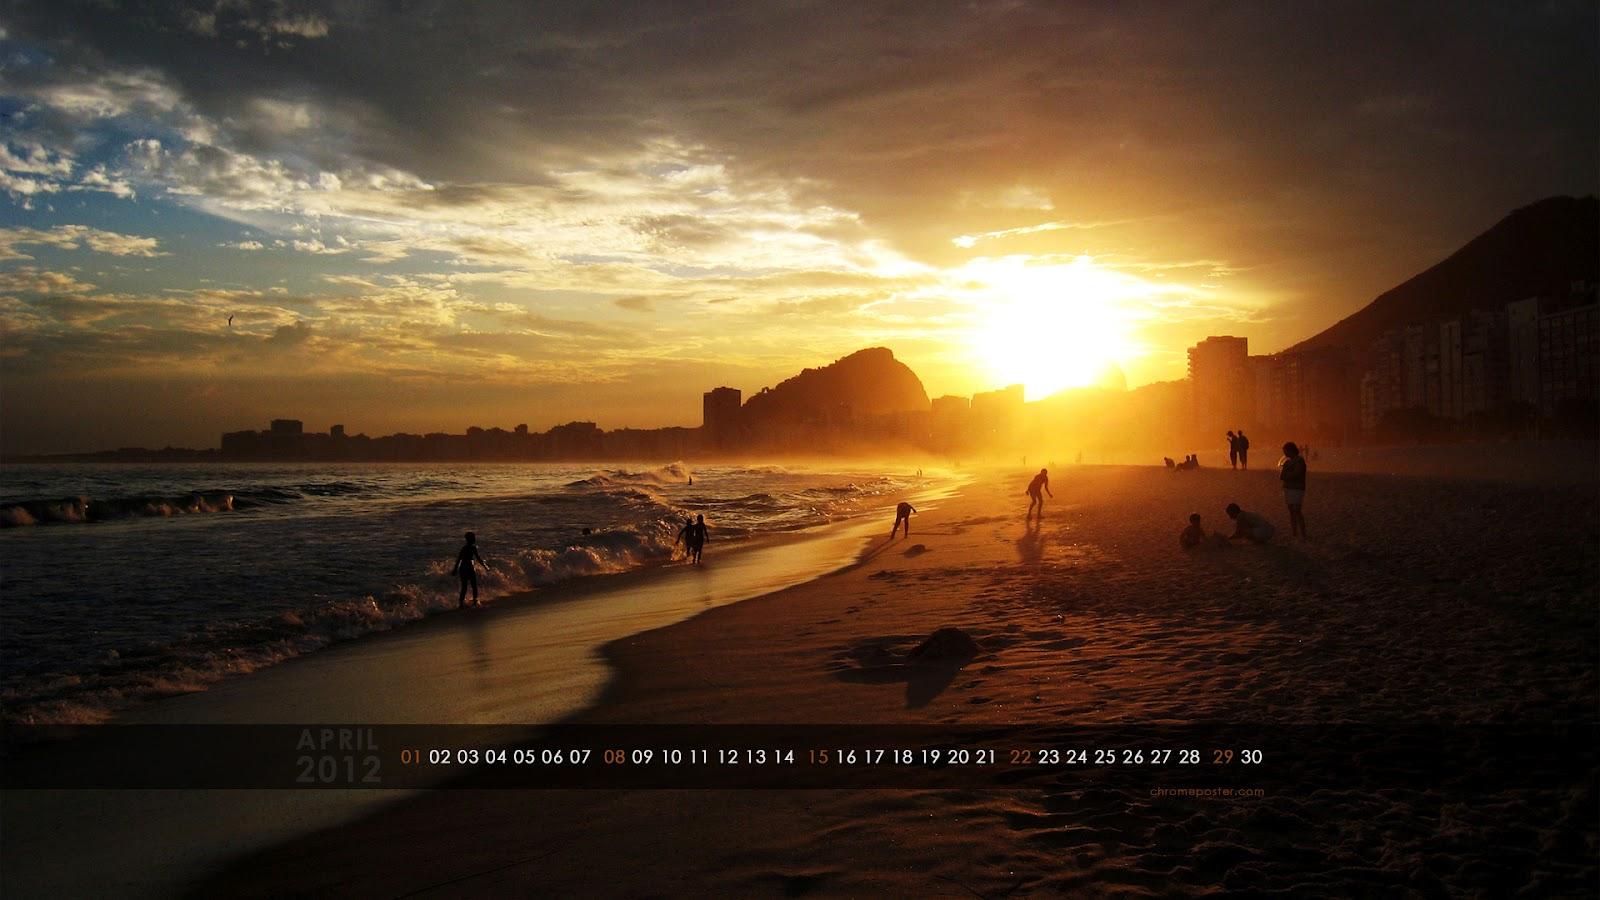 http://2.bp.blogspot.com/-ePukmXoJyVE/T3SLenuLiyI/AAAAAAAAGhs/Syt-mSG1QJk/s1600/beach-1920-x-1080.jpg